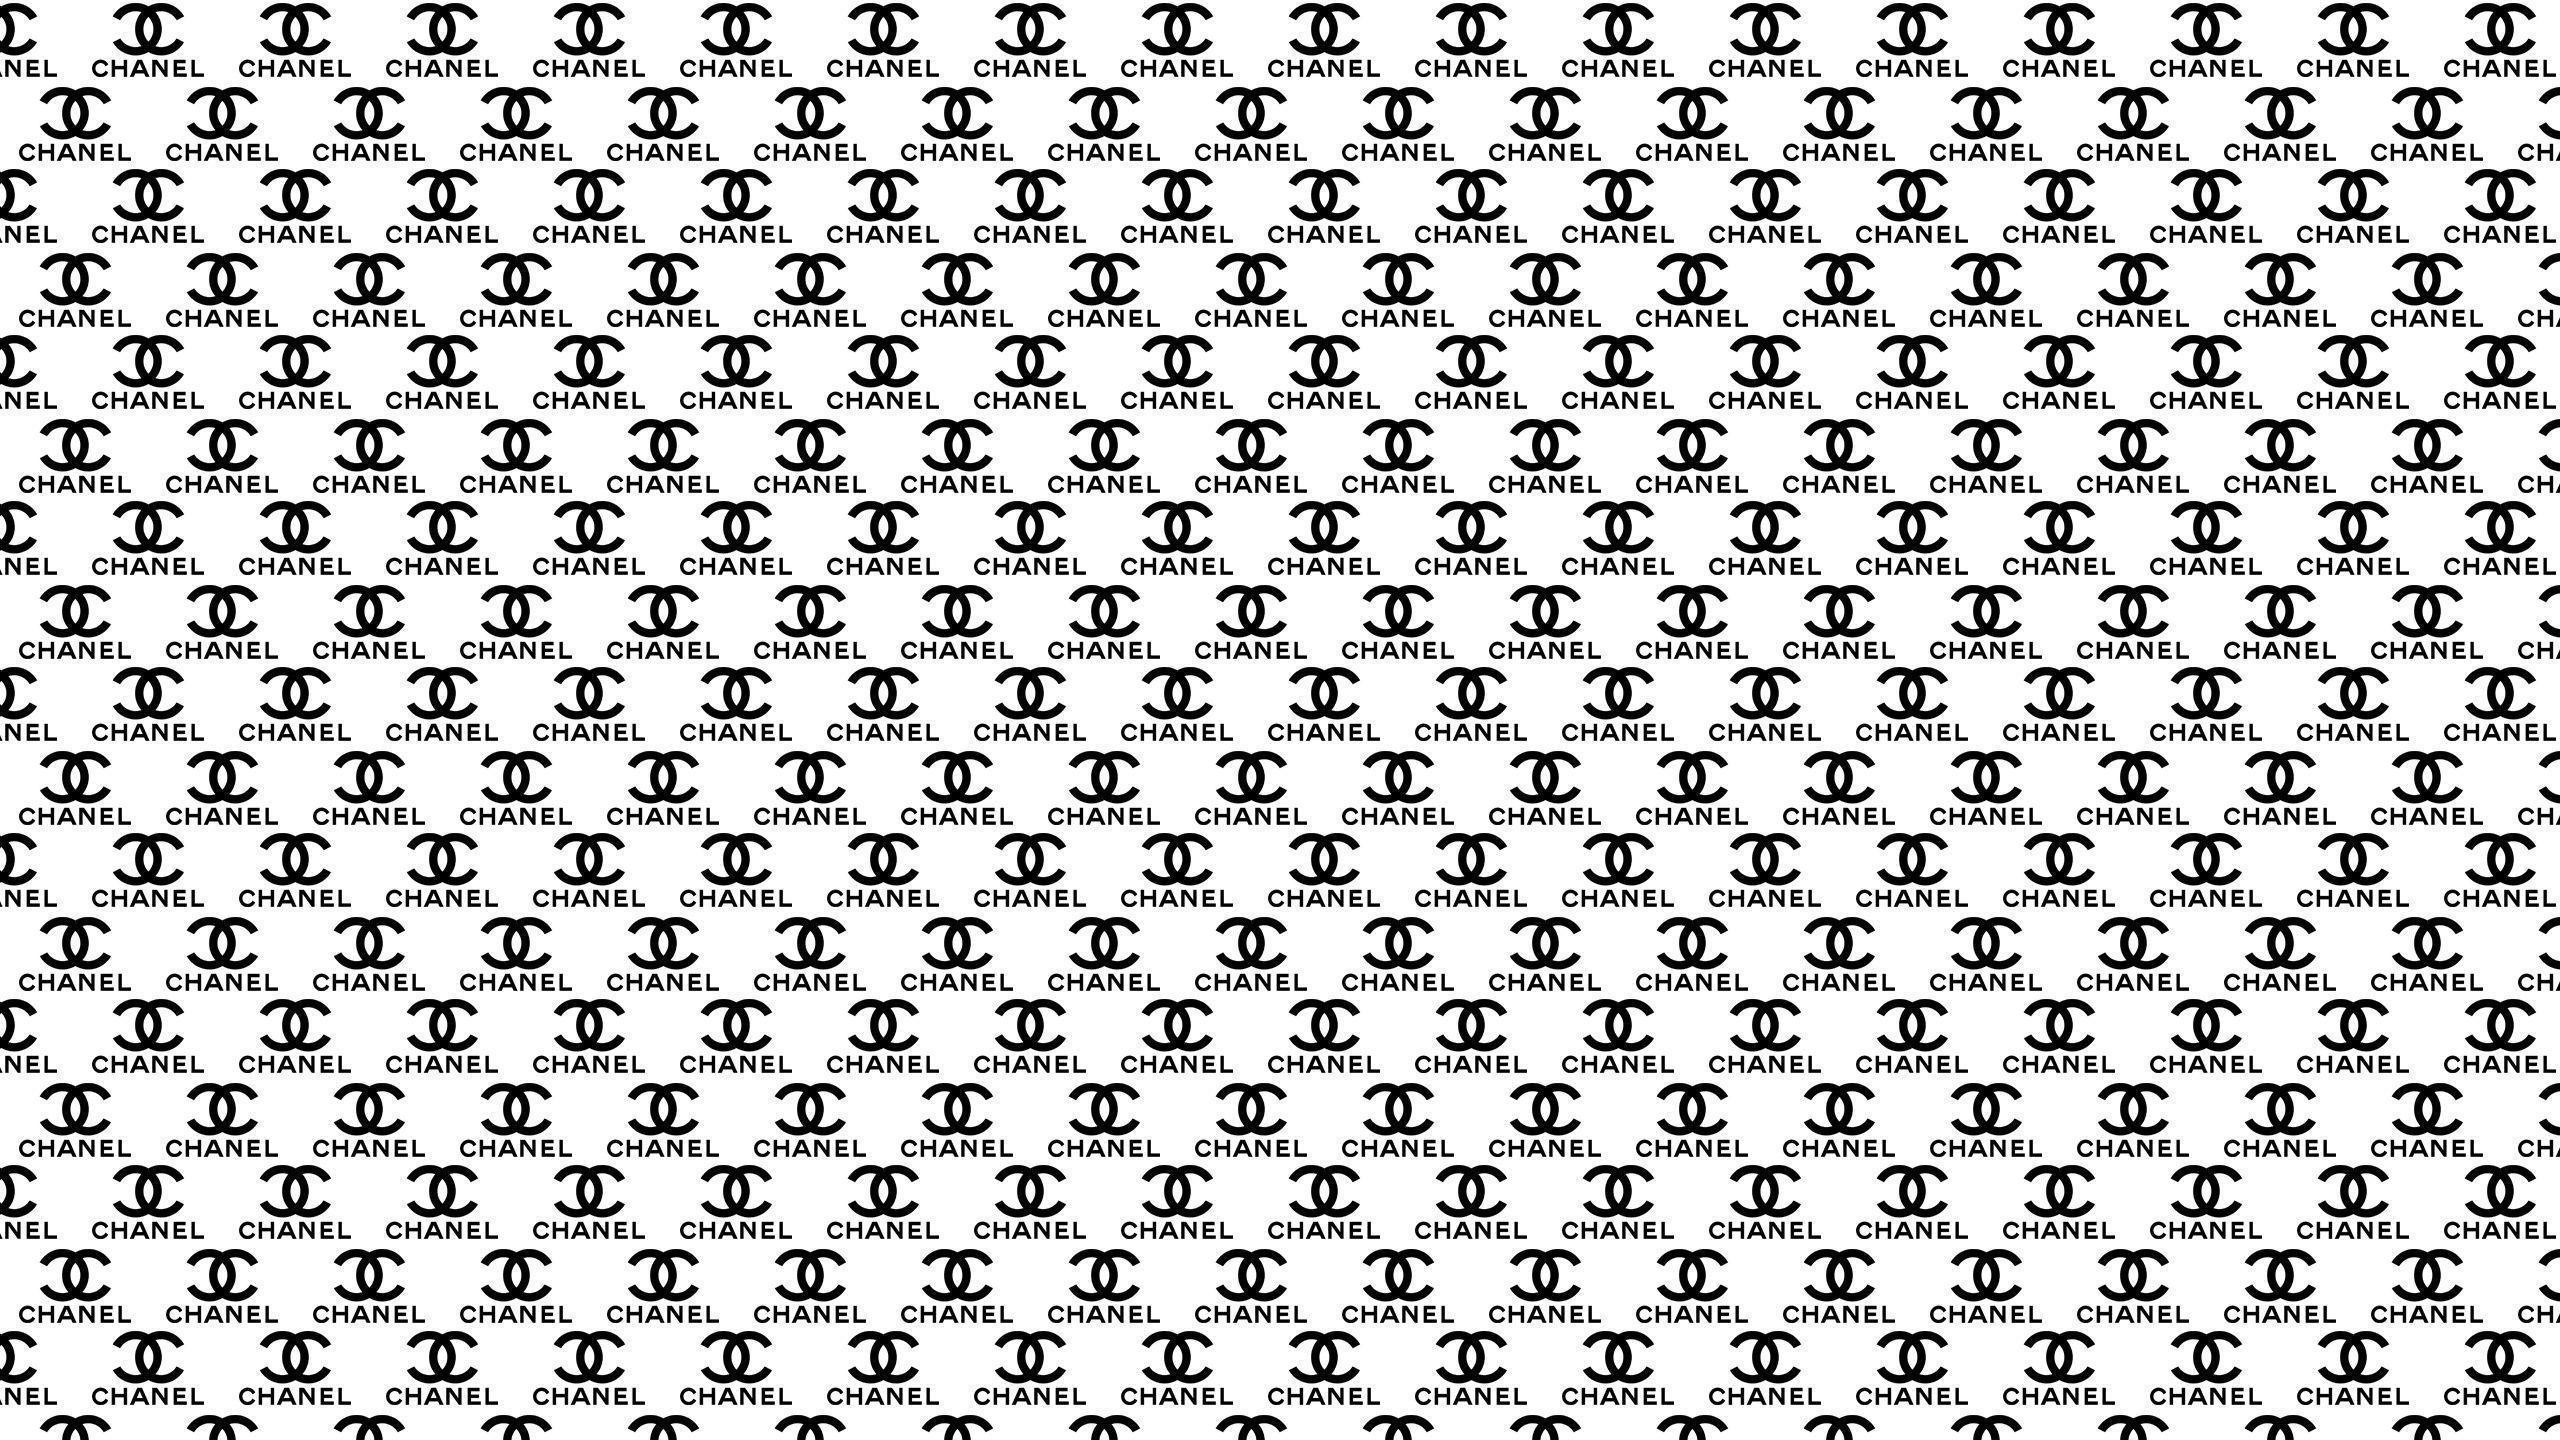 Chanel Wallpaper 1